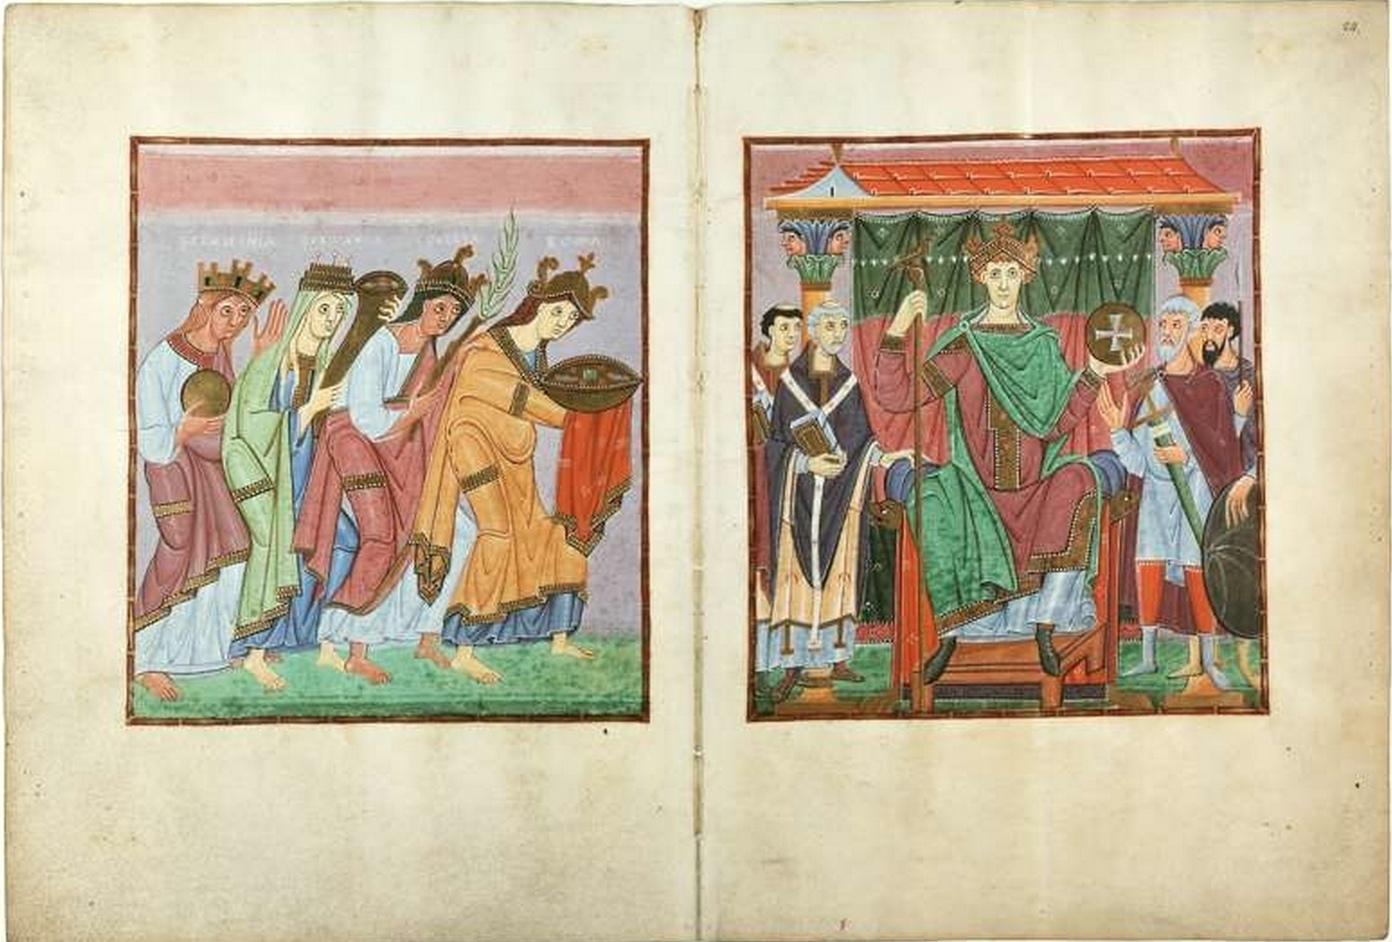 Gospels of Otto III (Munich, Bayerische Stattsbibliothek, Clm.4453), Ruler portrait of Otto III (f.24) and Provinces Bringing Tribute (f.23v.)